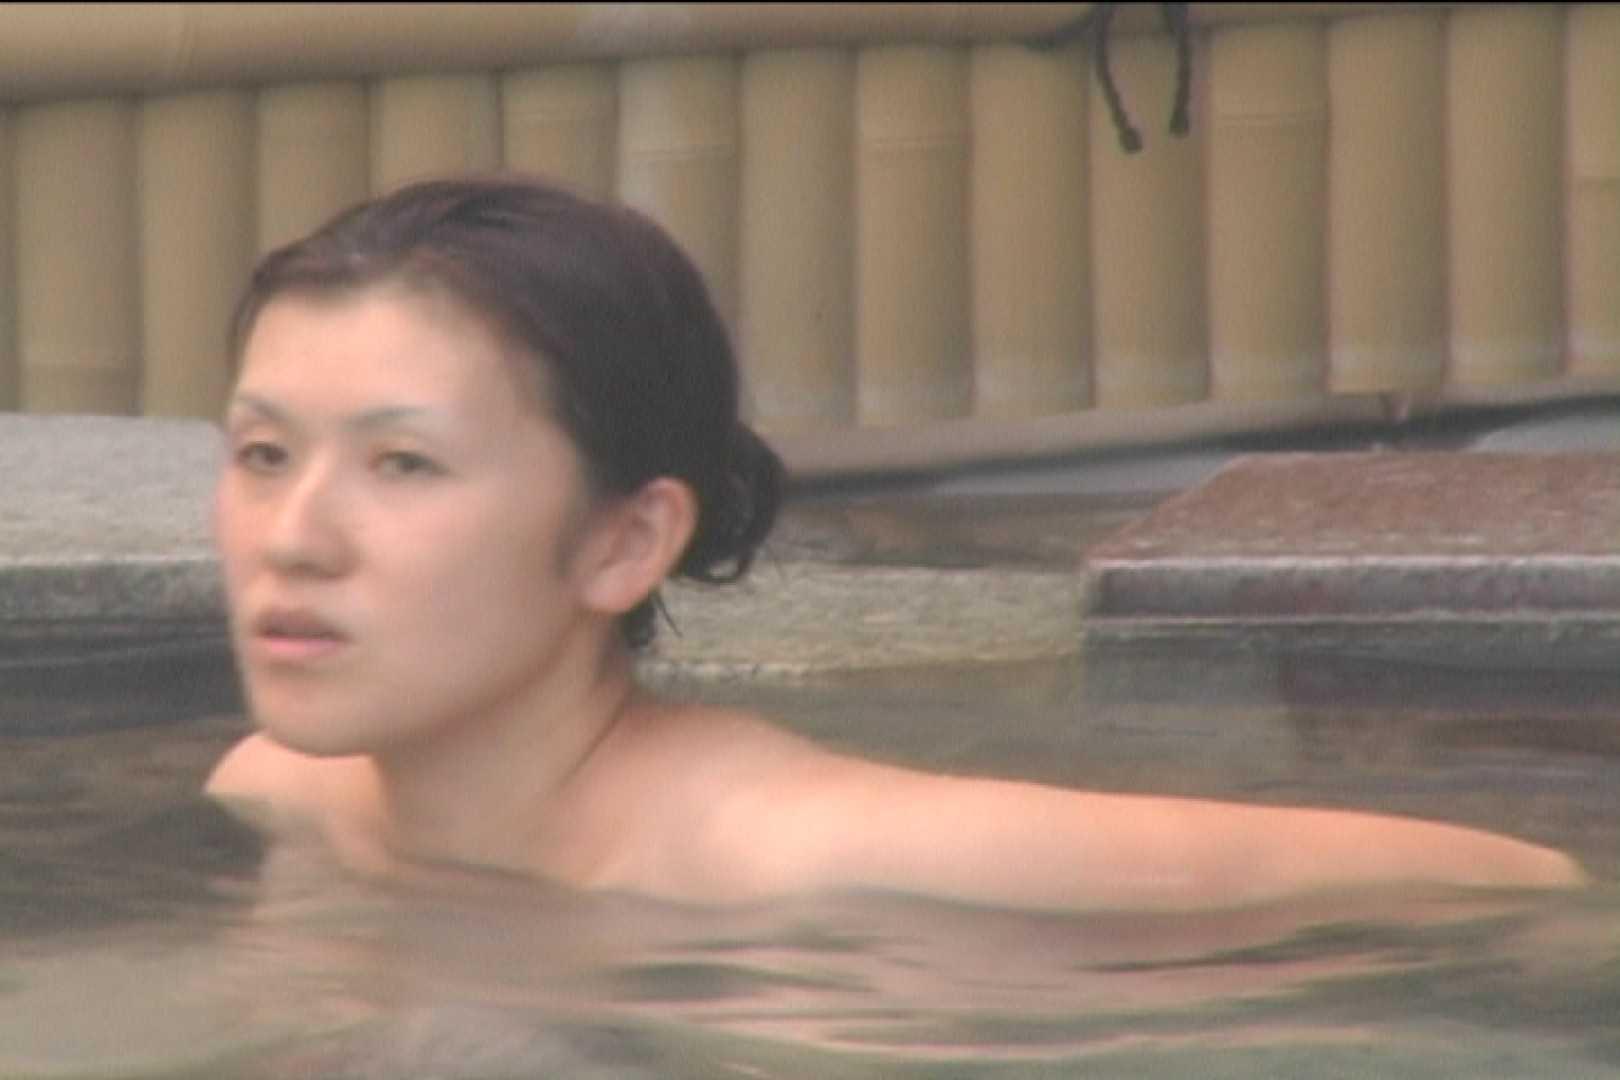 Aquaな露天風呂Vol.532 OLセックス 盗撮ワレメ無修正動画無料 105画像 44